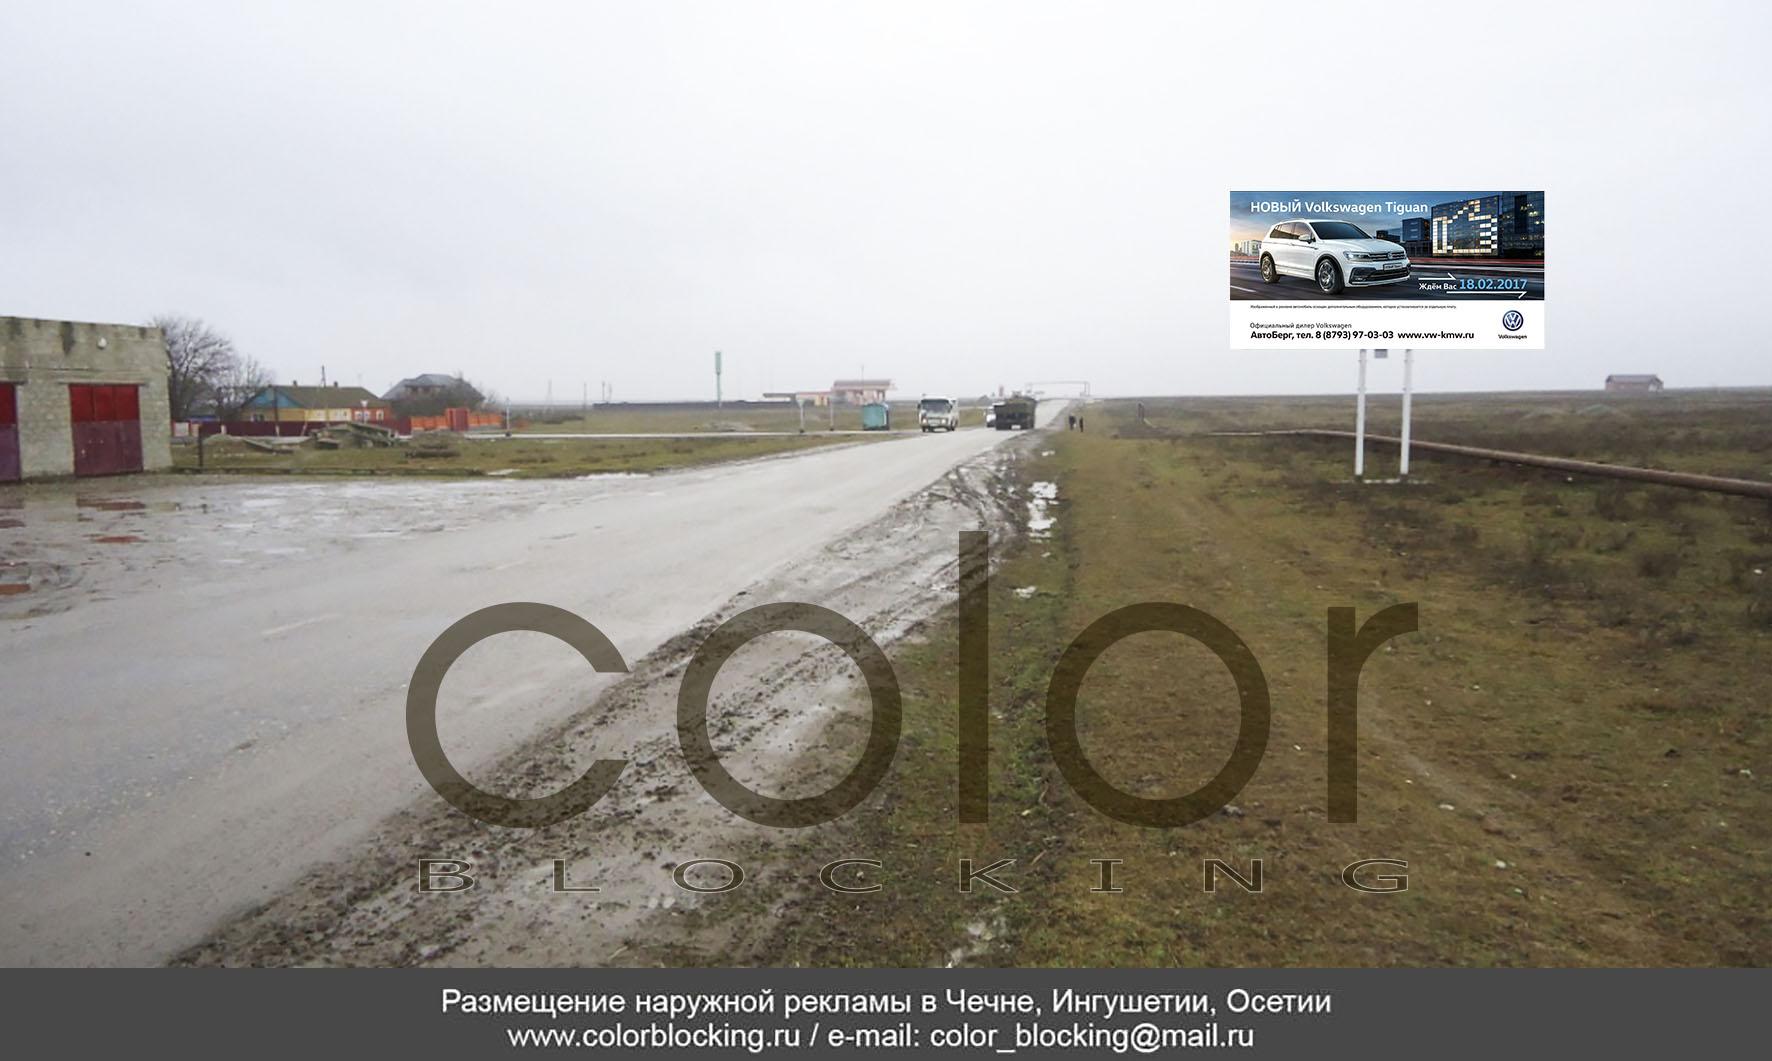 Наружная реклама в населенных пунктах Чечни Кень-Юрт